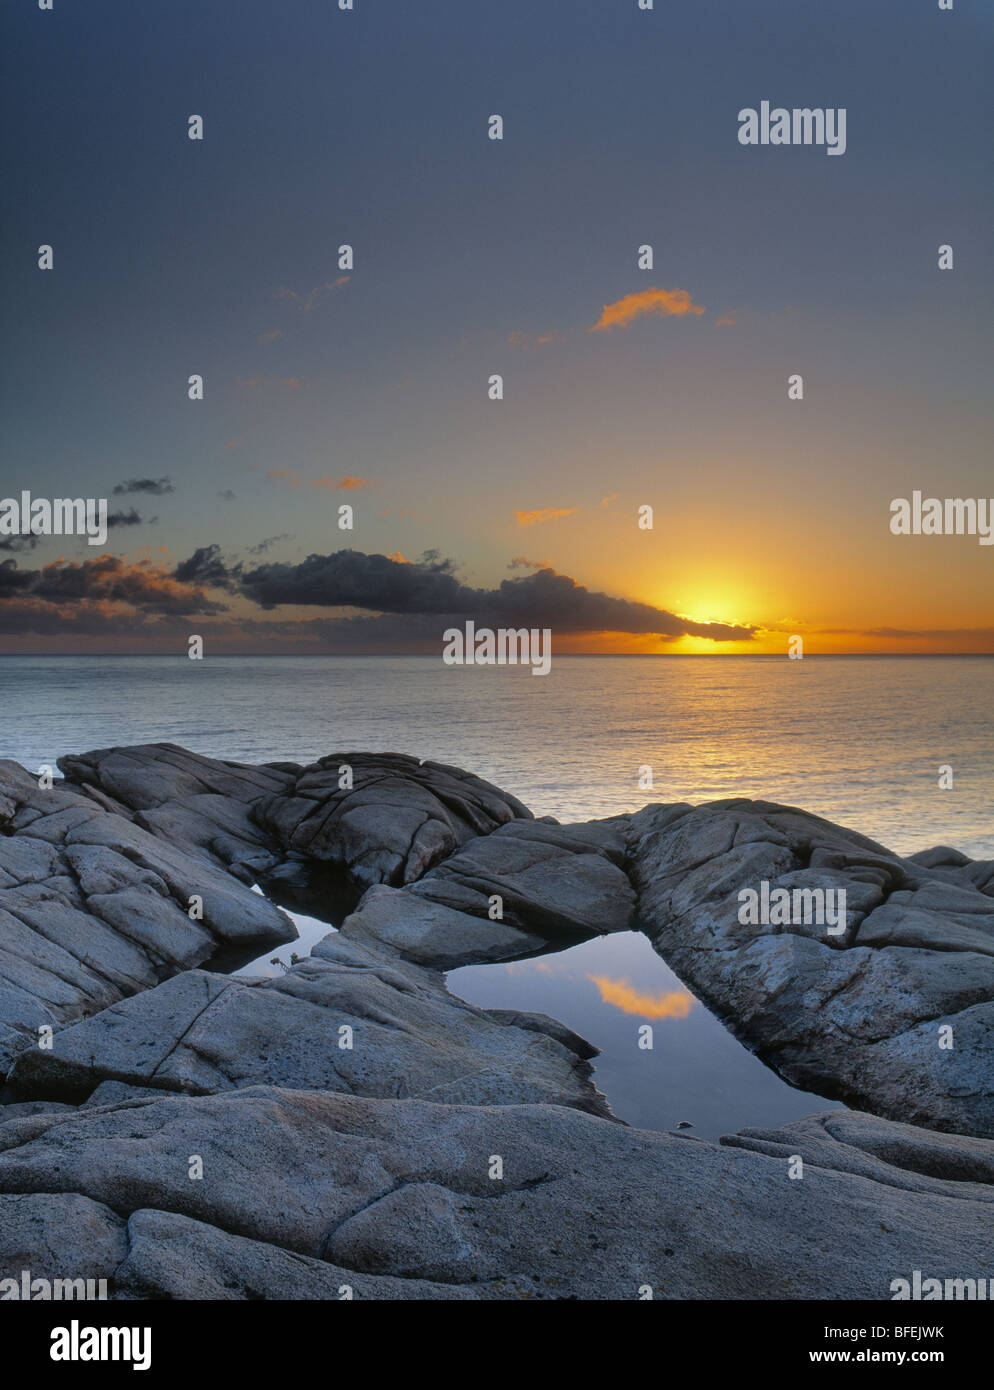 Sunset over Lakie's Head, Cape Breton Highlands National Park, Nova Scotia, Canada - Stock Image